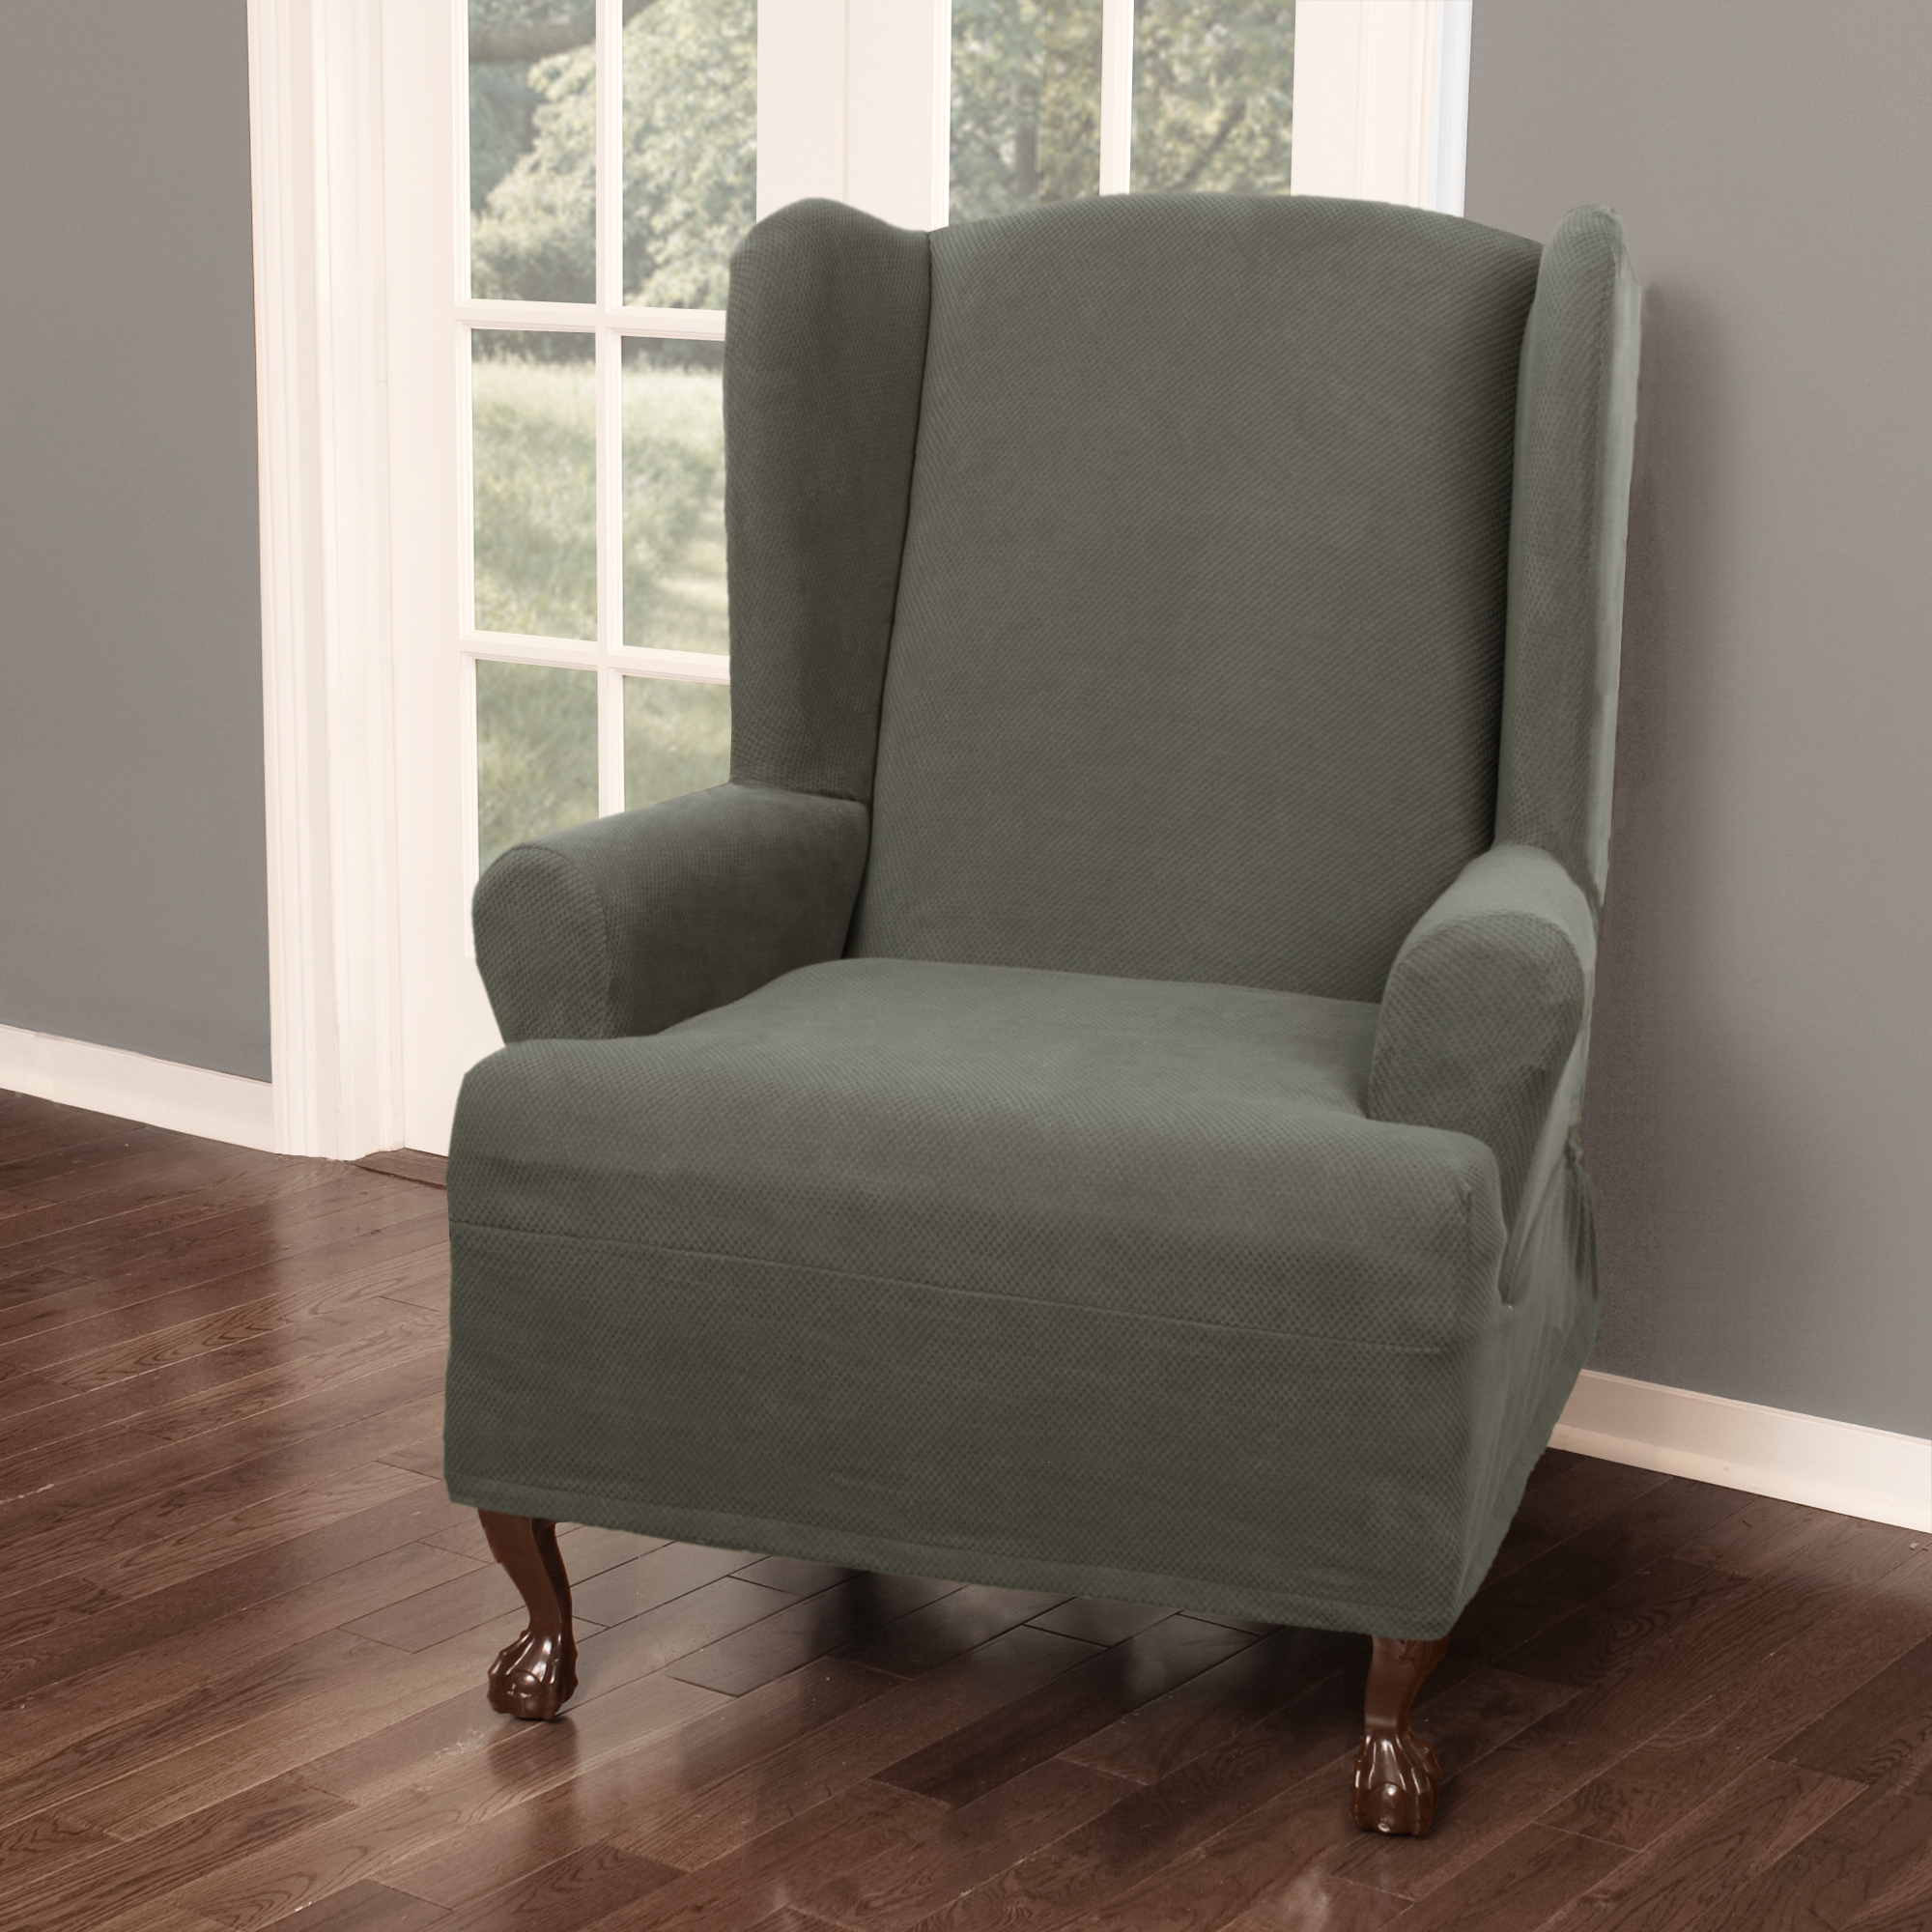 New MAYTEX Pixel Ultra Soft Stretch 1 Piece Wing Back Arm Chair Furniture Cov..